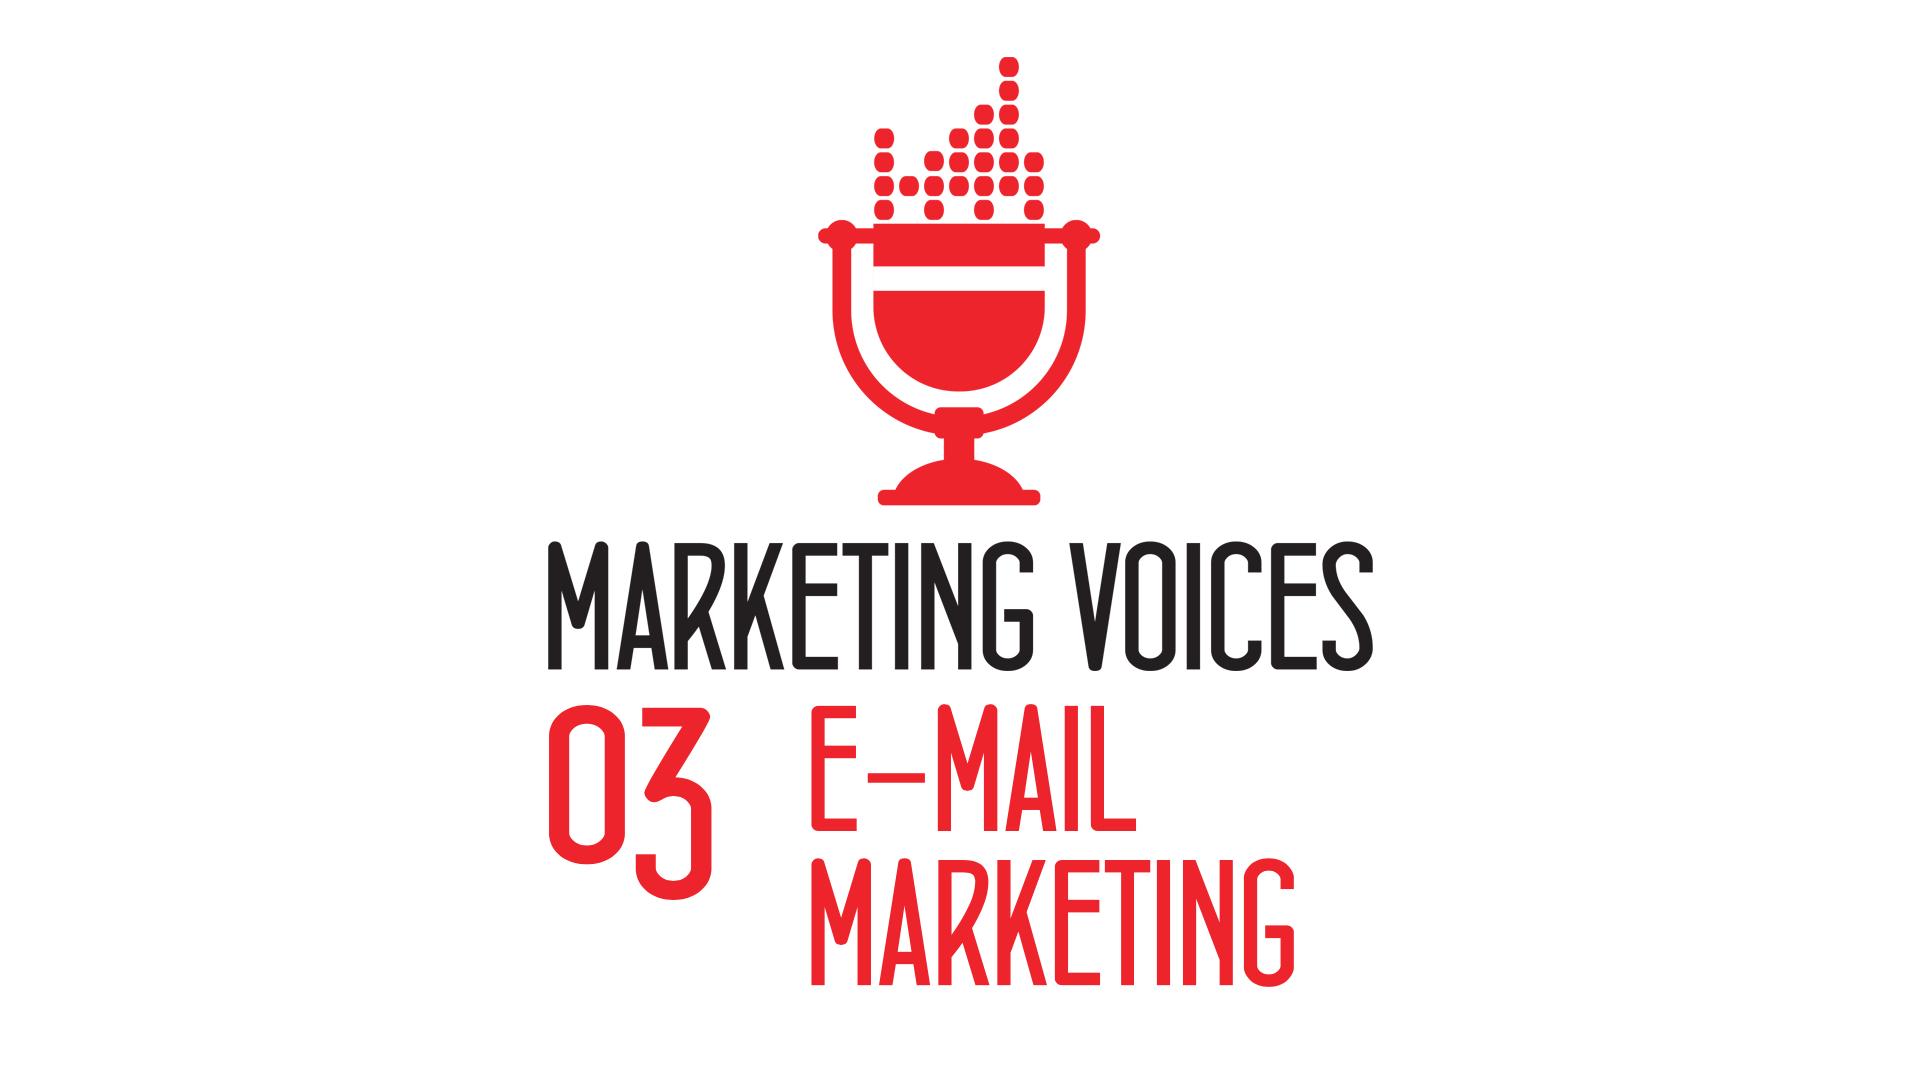 e-mail marketing acumbamail sonia montanari